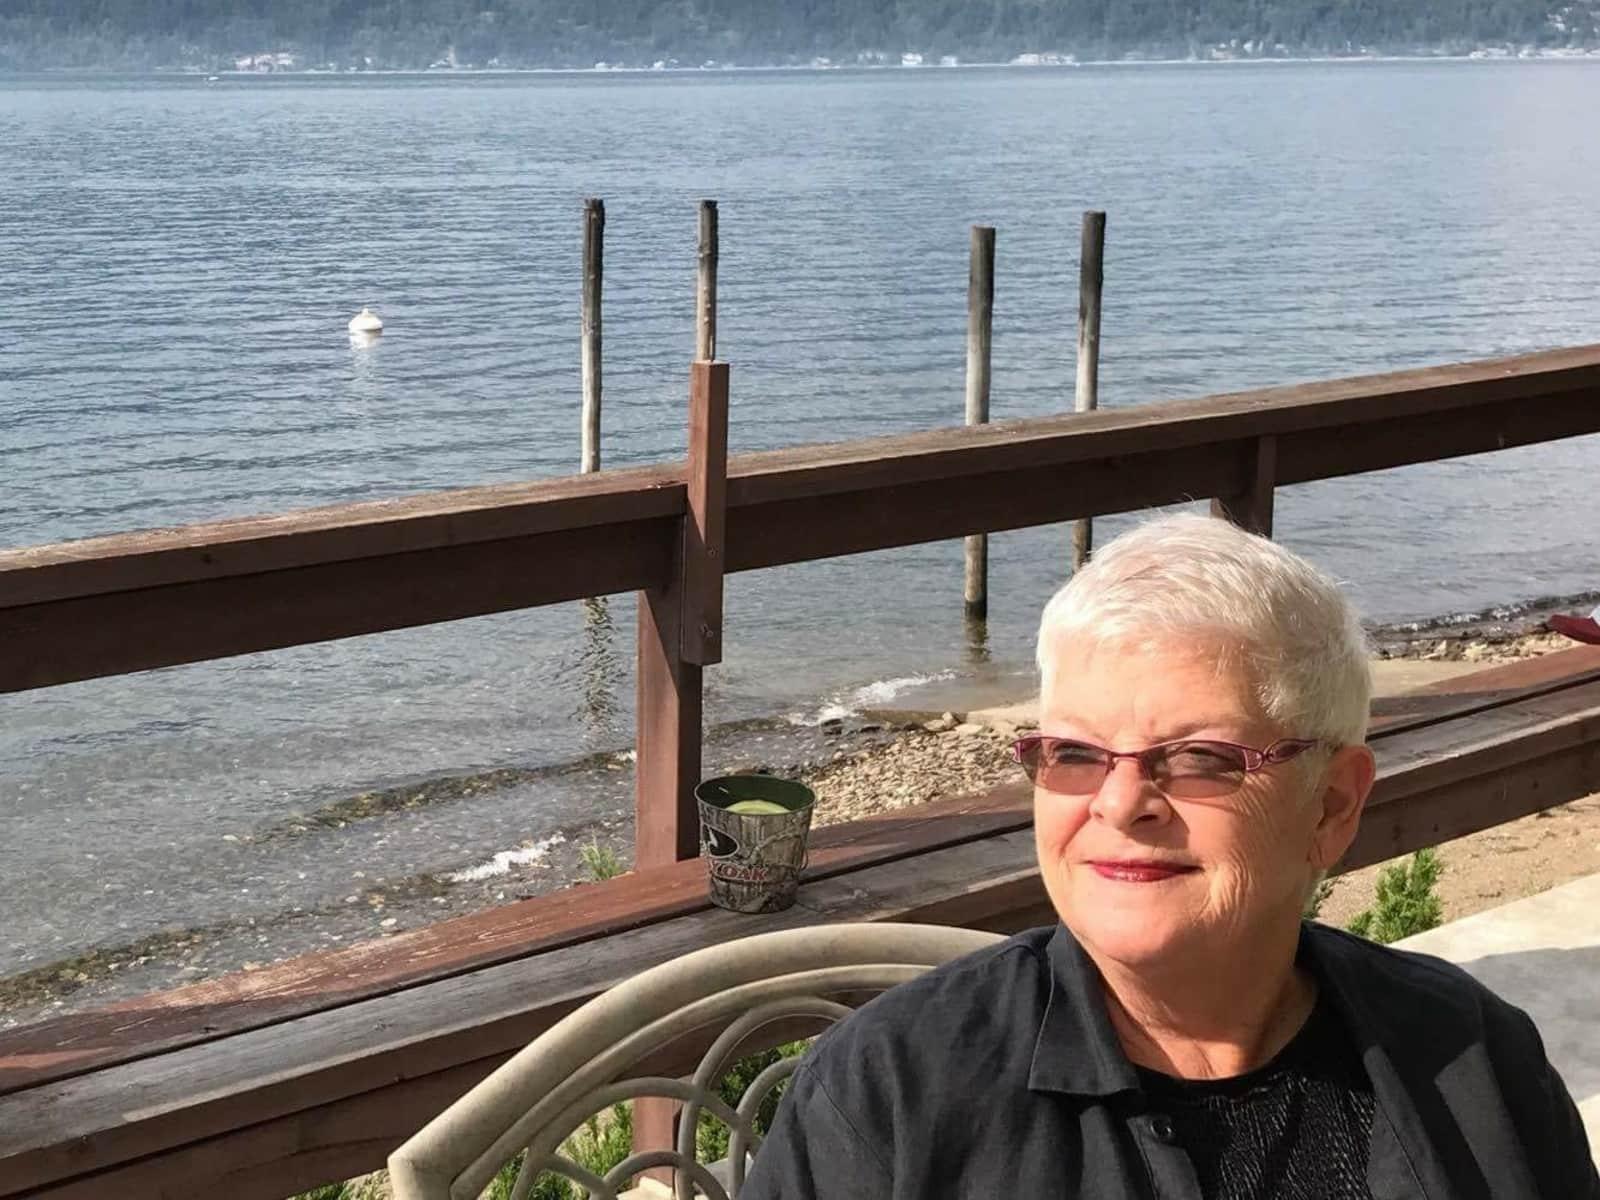 Joanne from Kamloops, British Columbia, Canada